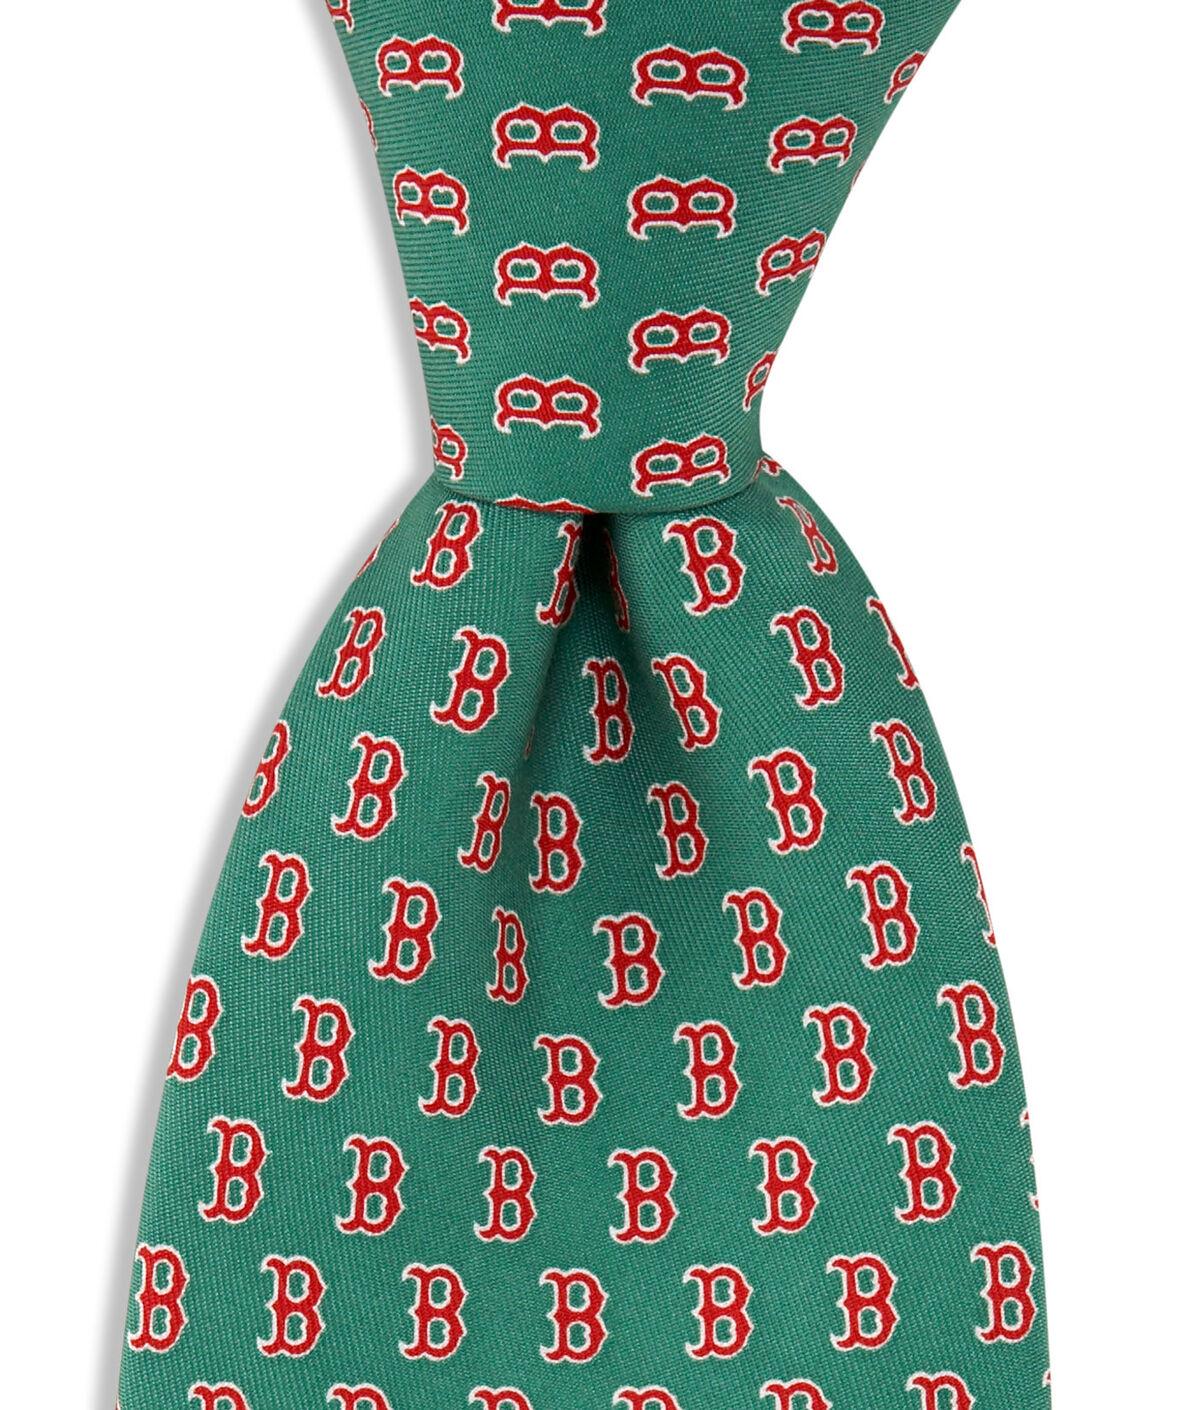 Boston Red Sox Tie Zoom In